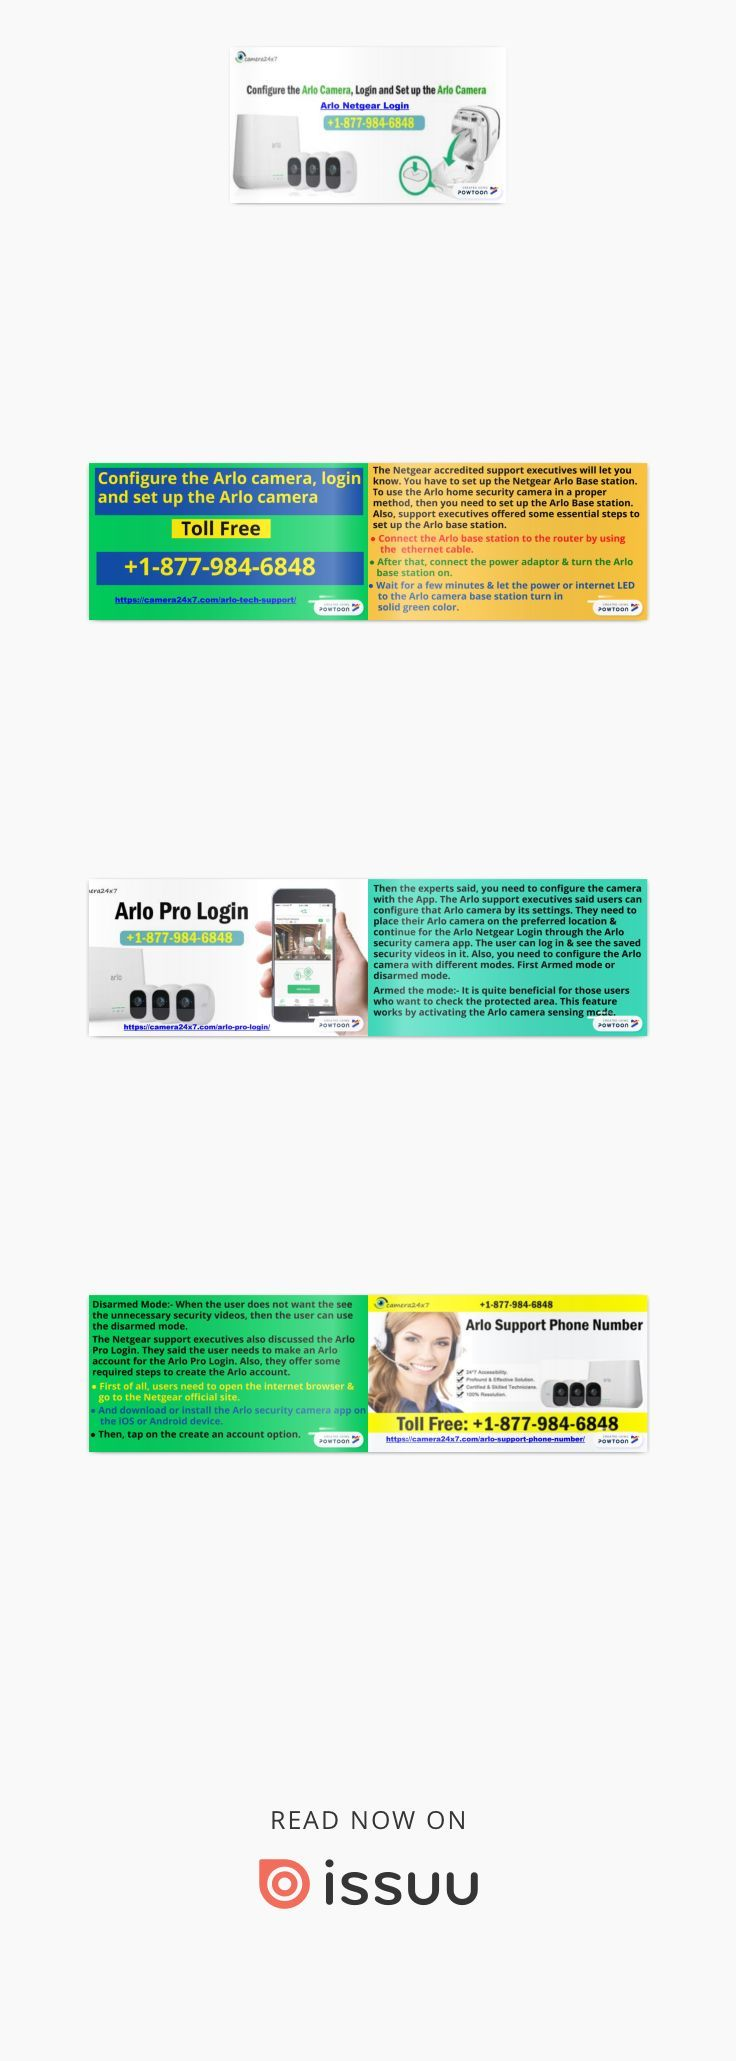 Configure the Arlo camera 18779846848 Login and Setup the